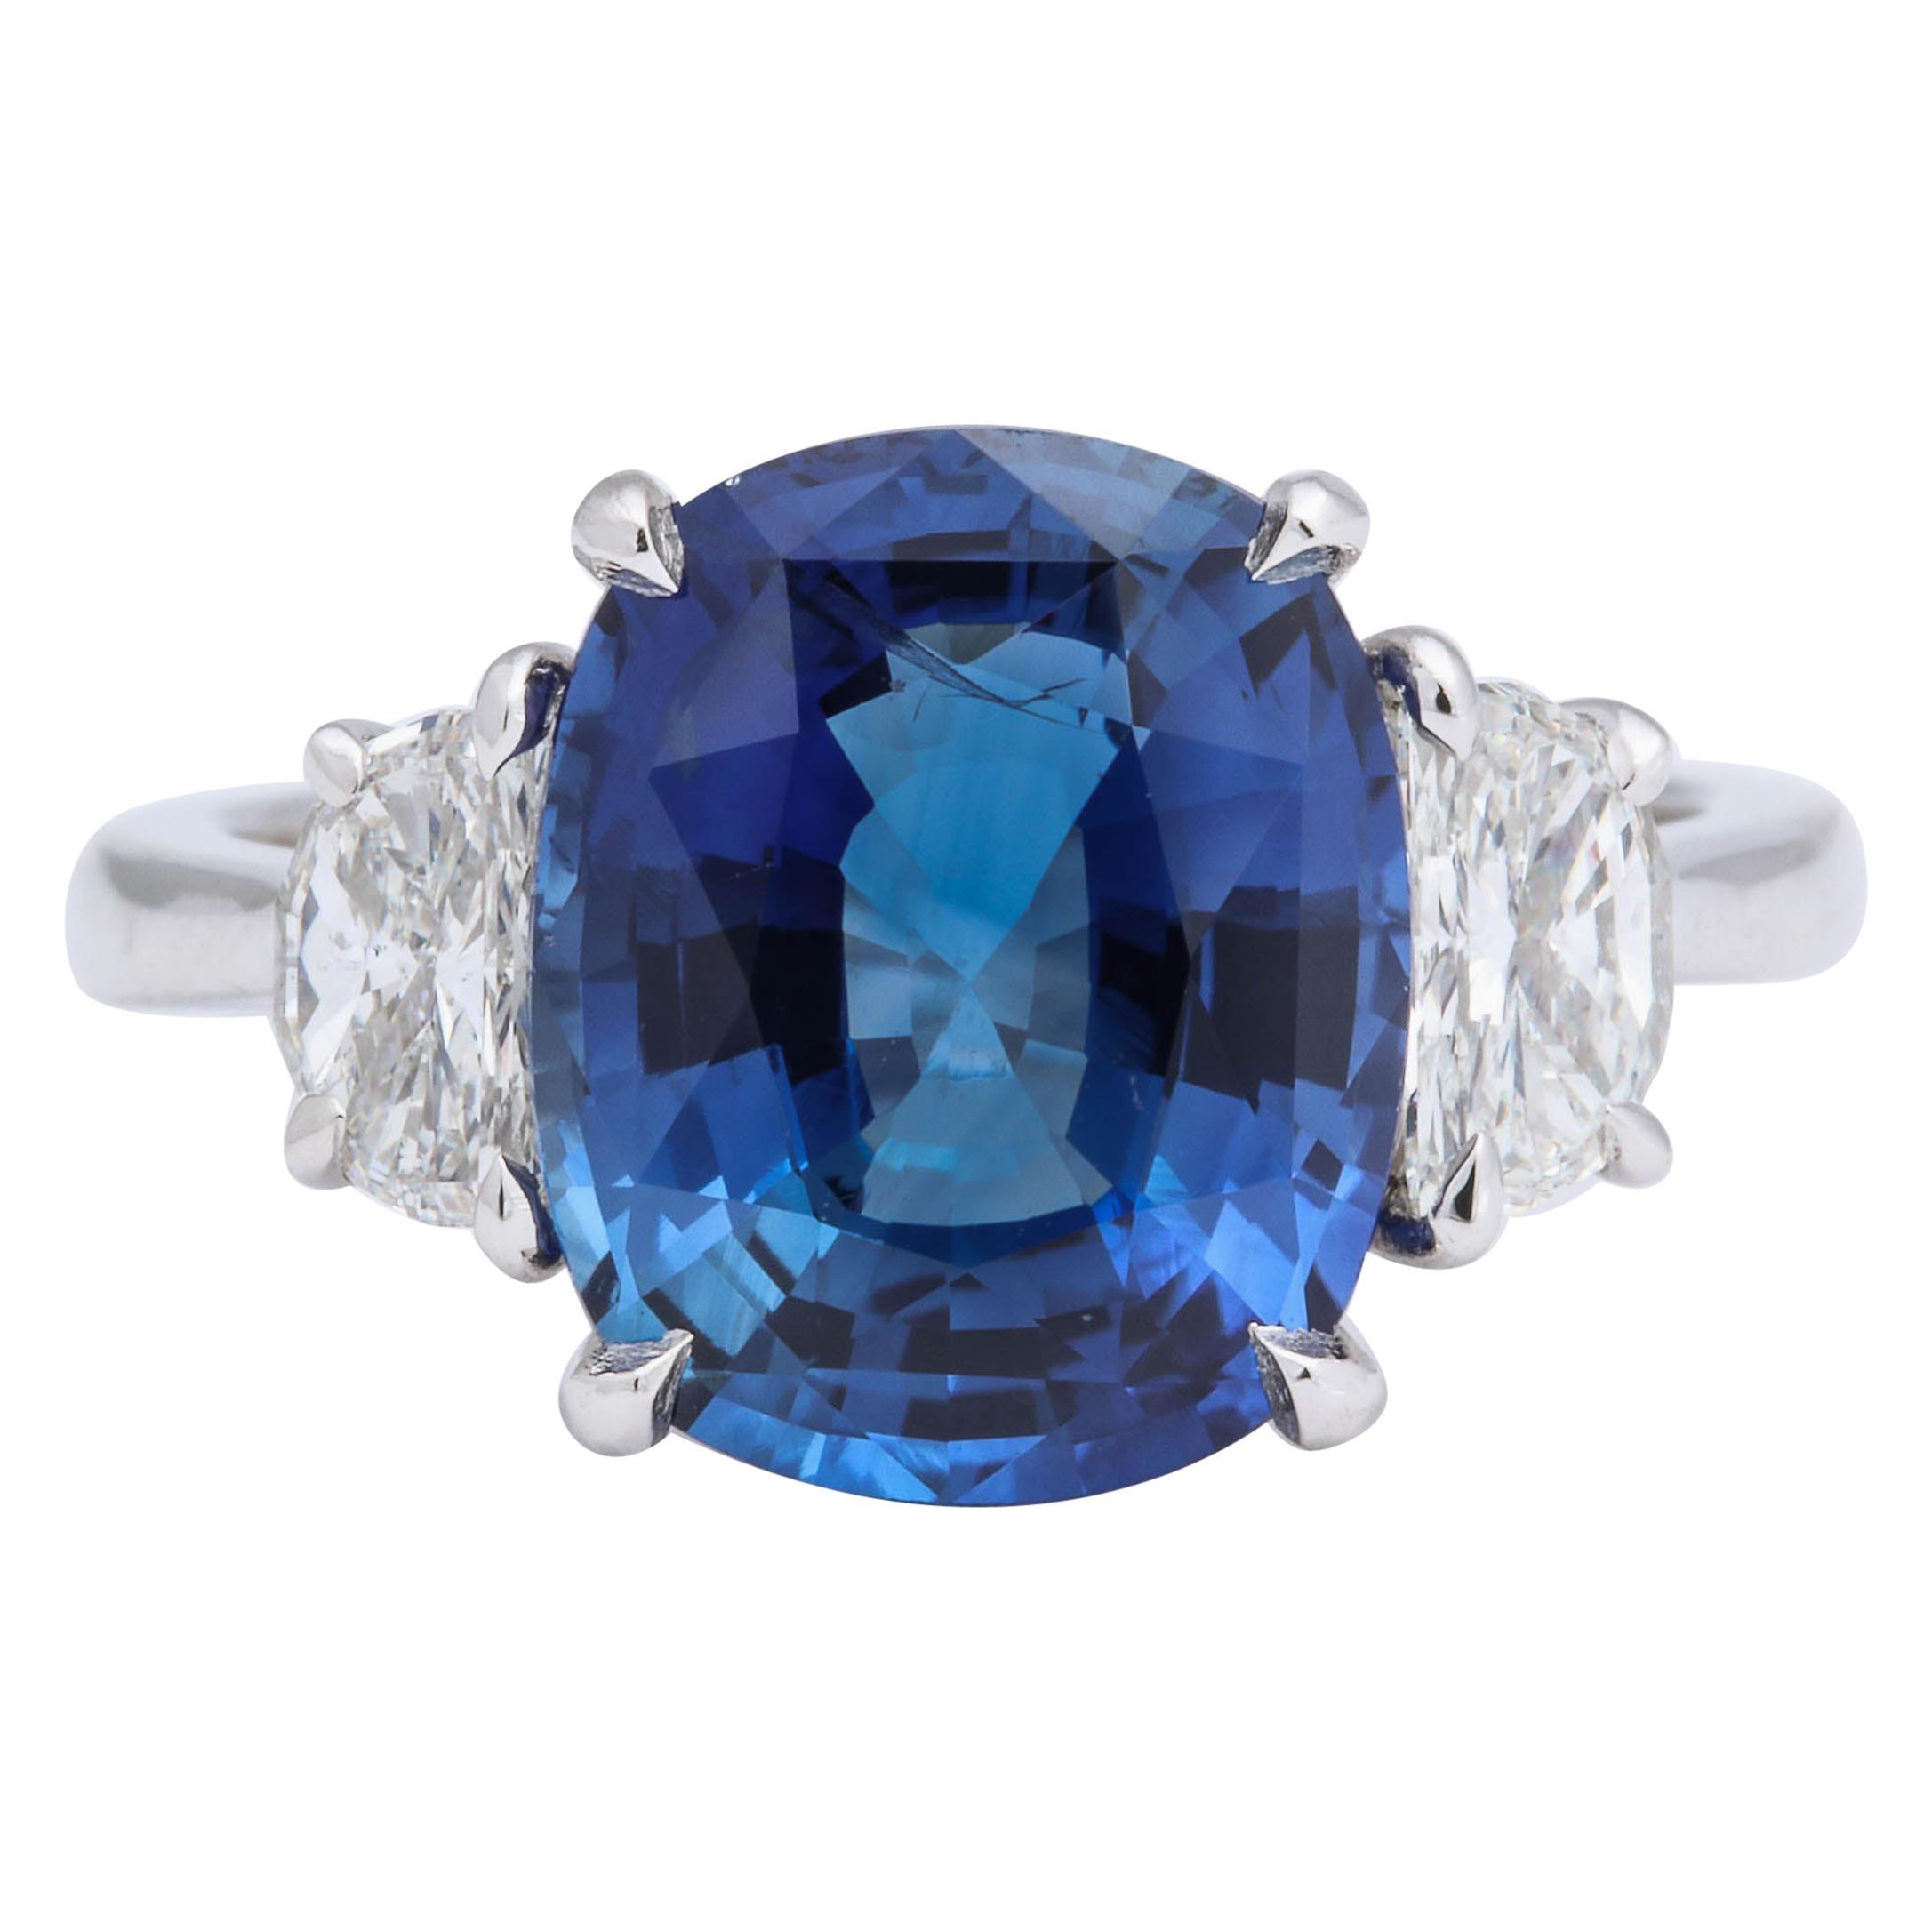 5 Carat Cushion Cut Blue Sapphire and Diamond Ring